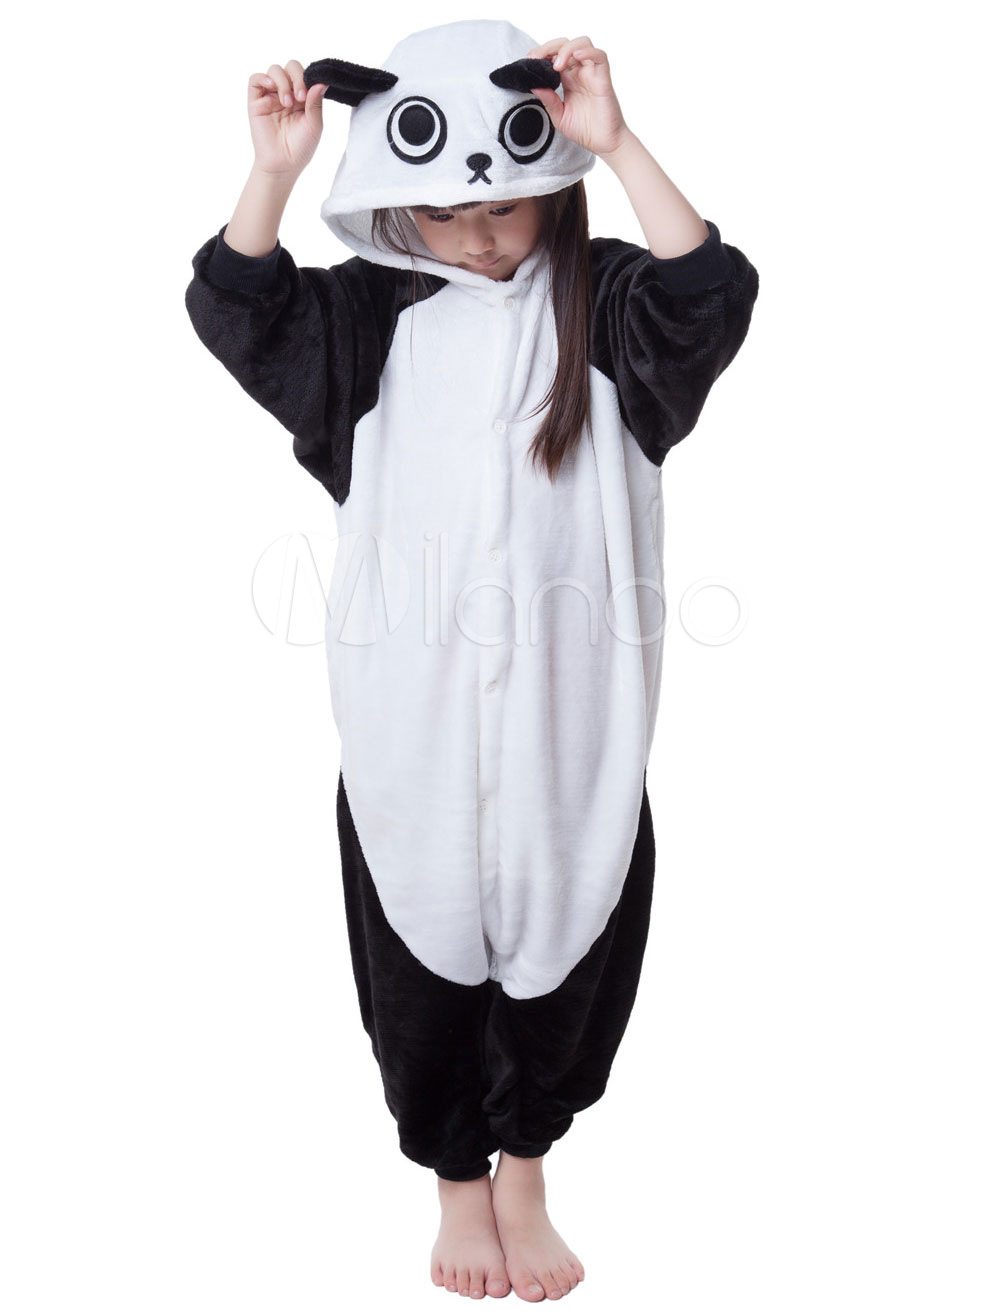 Buy Kigurumi Pajama Panda Onesie For Kids Black Synthetic Jumpsuit Mascot Costume Halloween for $16.79 in Milanoo store